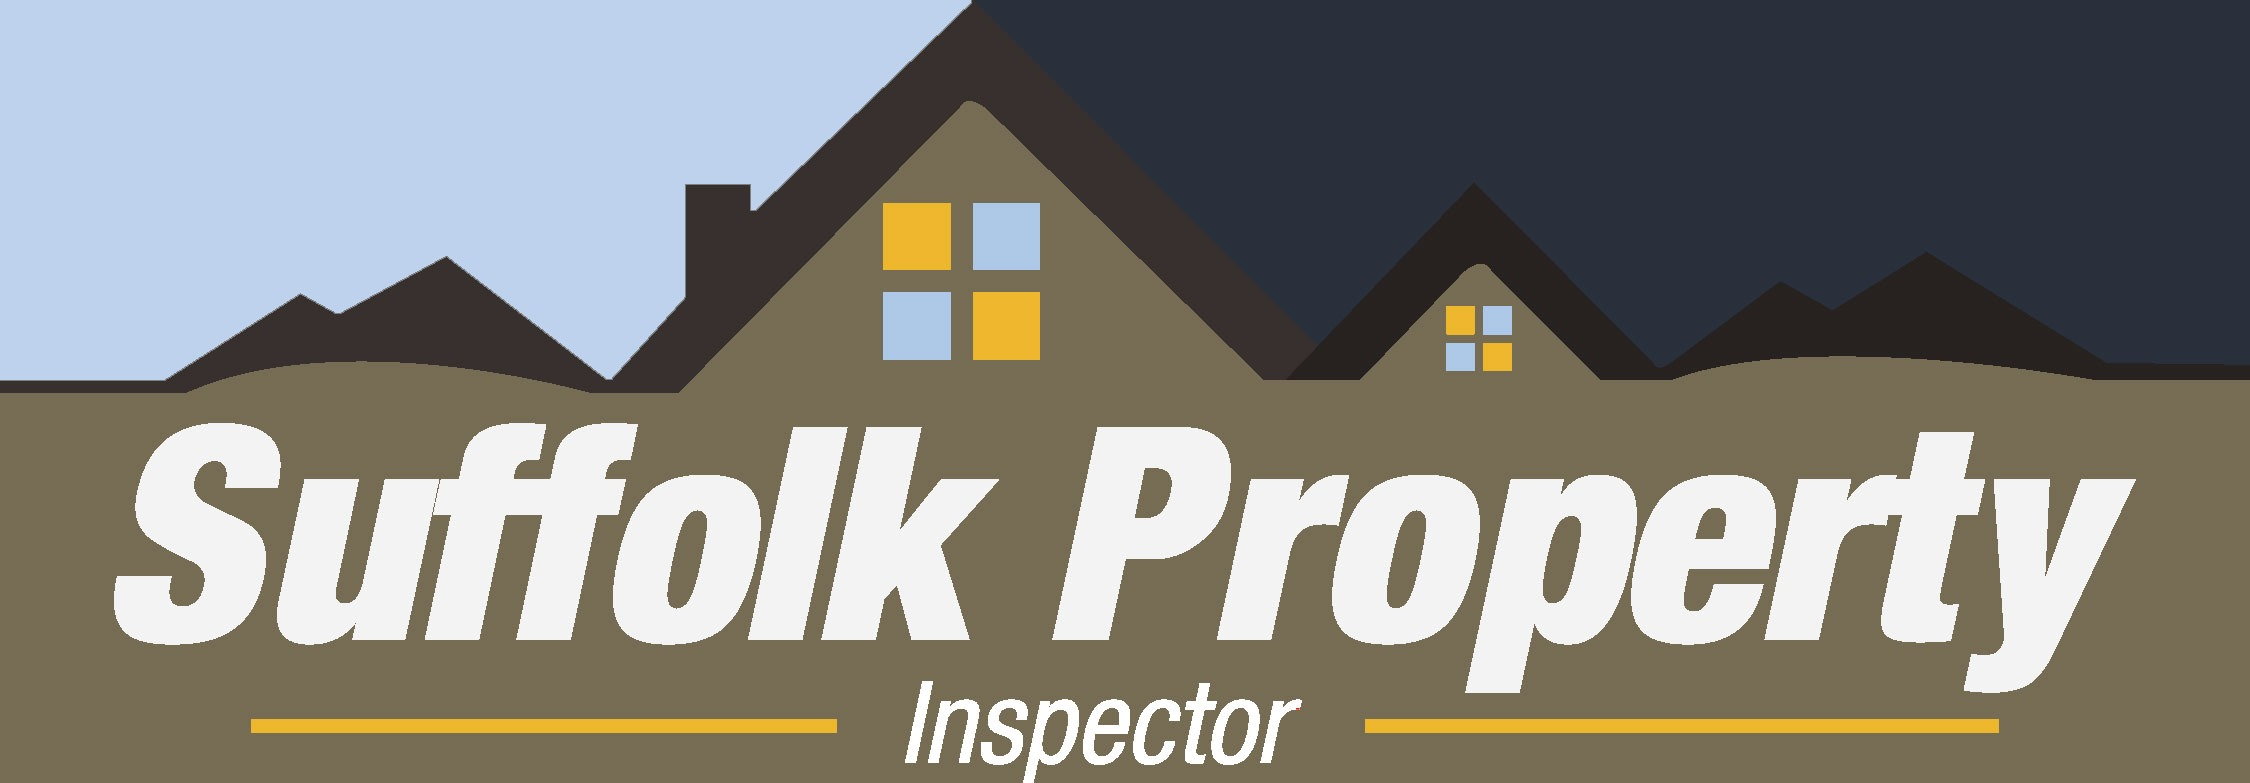 Suffolk Property Inspector